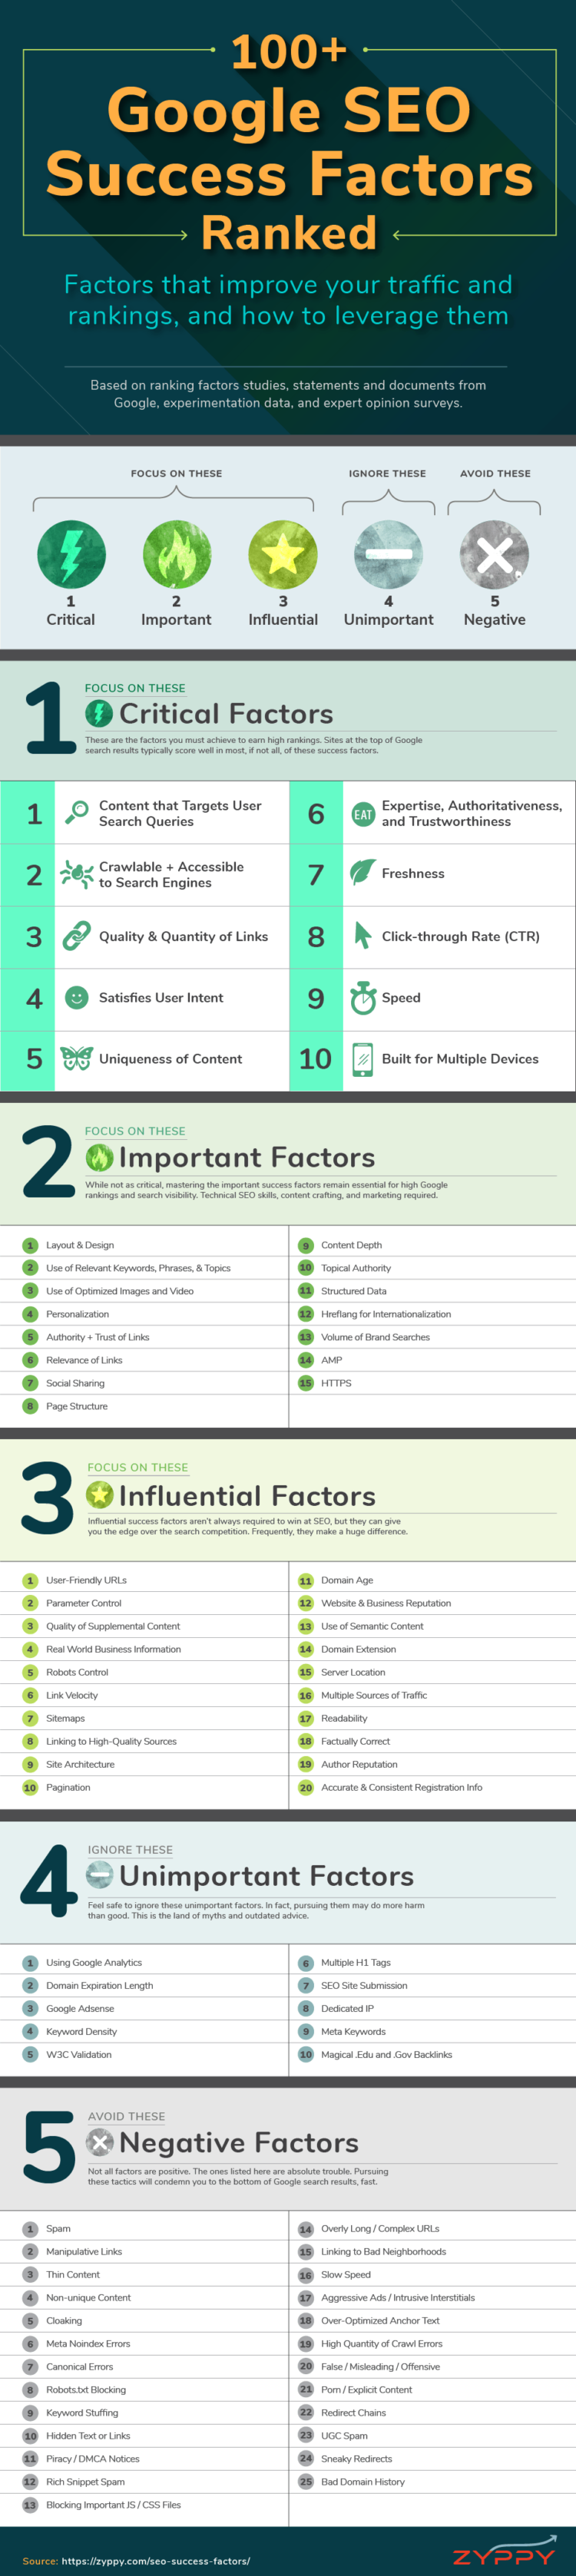 100+ Google SEO Success Factors Ranked [Infographic] | Social Media Today